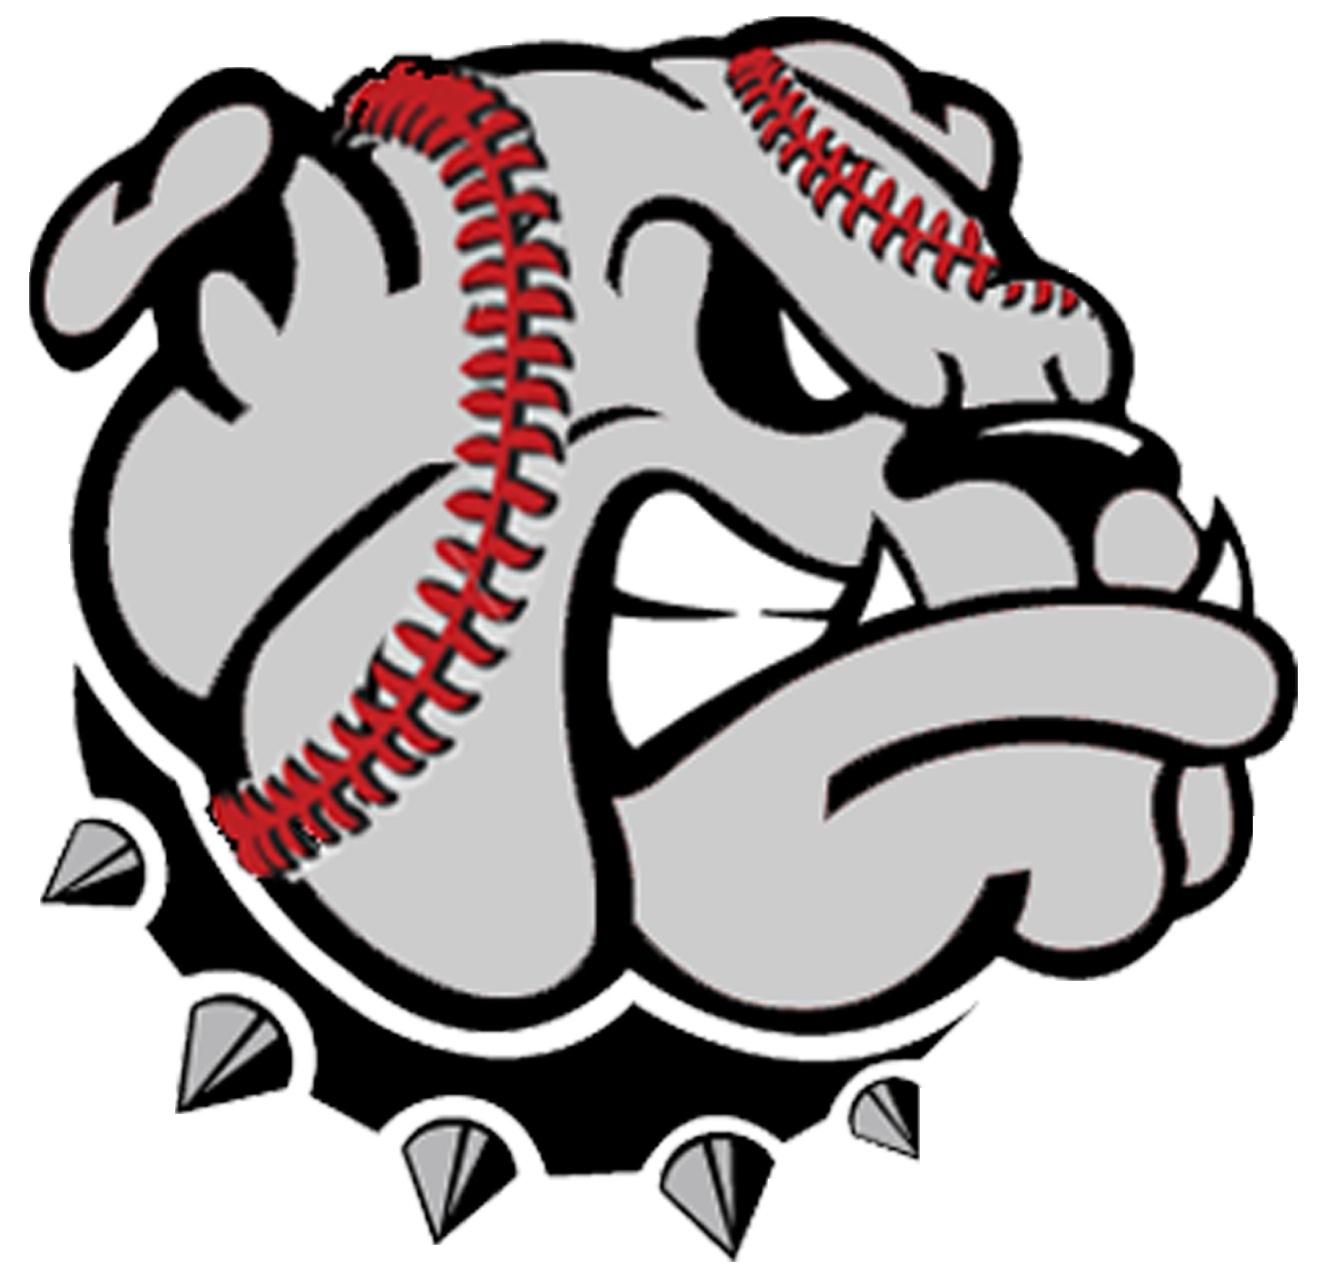 Bulldog playing baseball clipart image library download The University of Baseball - About UB image library download